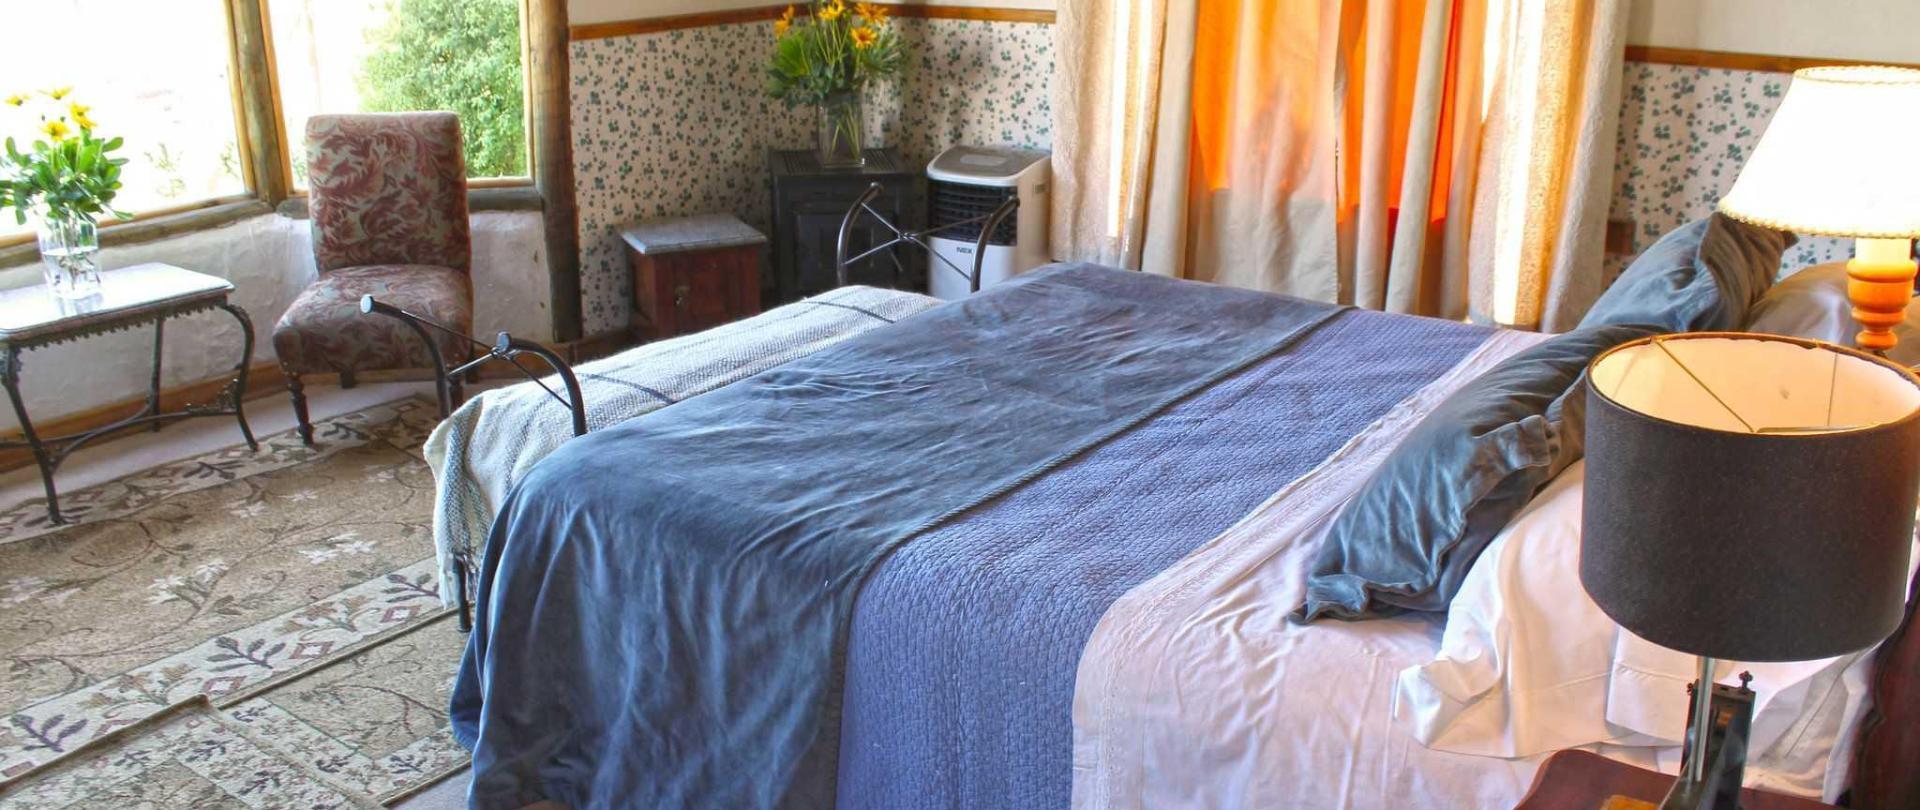 hotel-vendimia-parador-santa-cruz-valle-de-colchagua-24.jpg